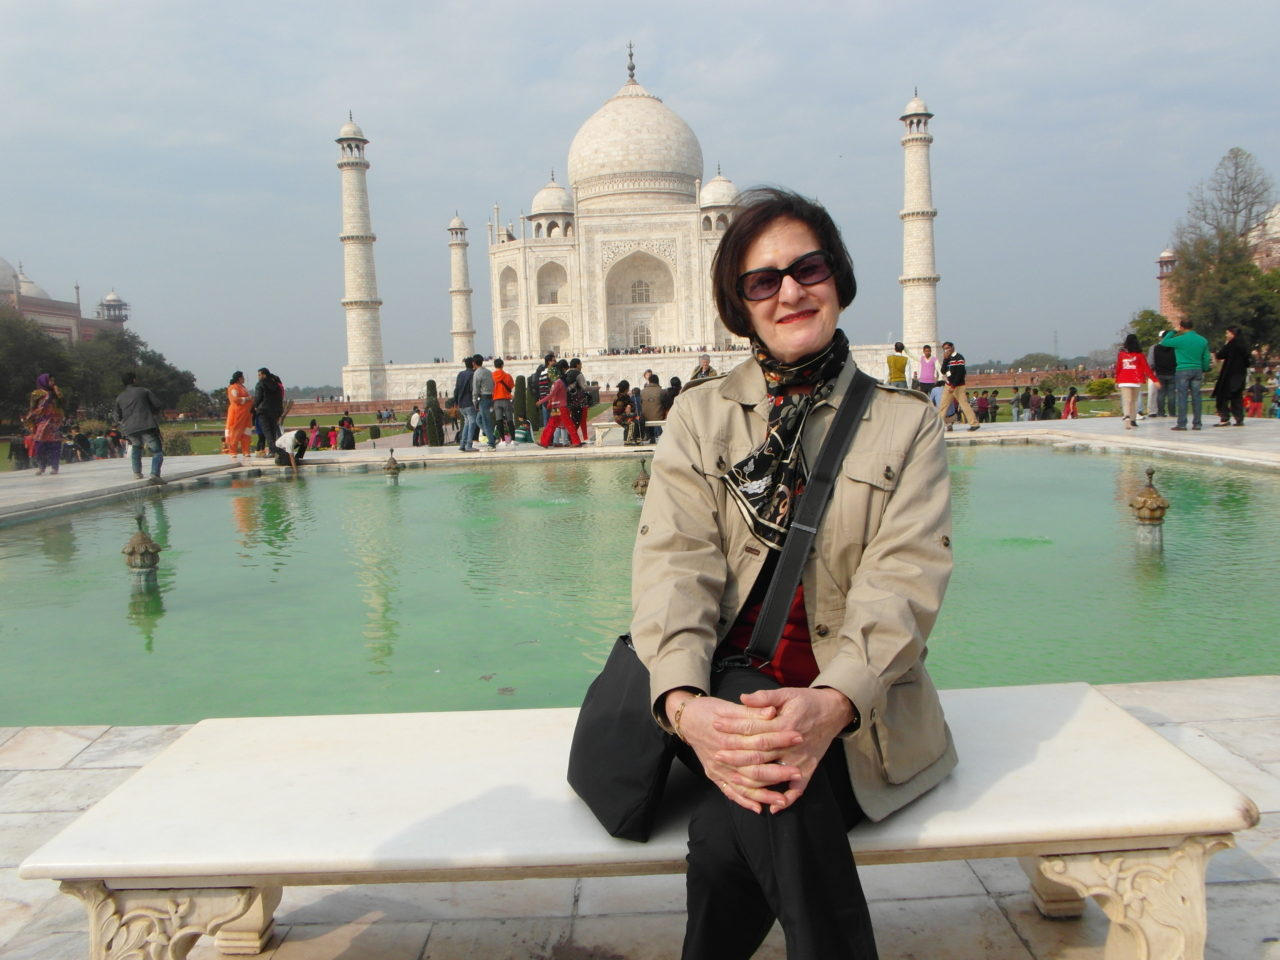 Lynn at the Taj Mahal in Agra, India ~ The Art of Travel Preparation